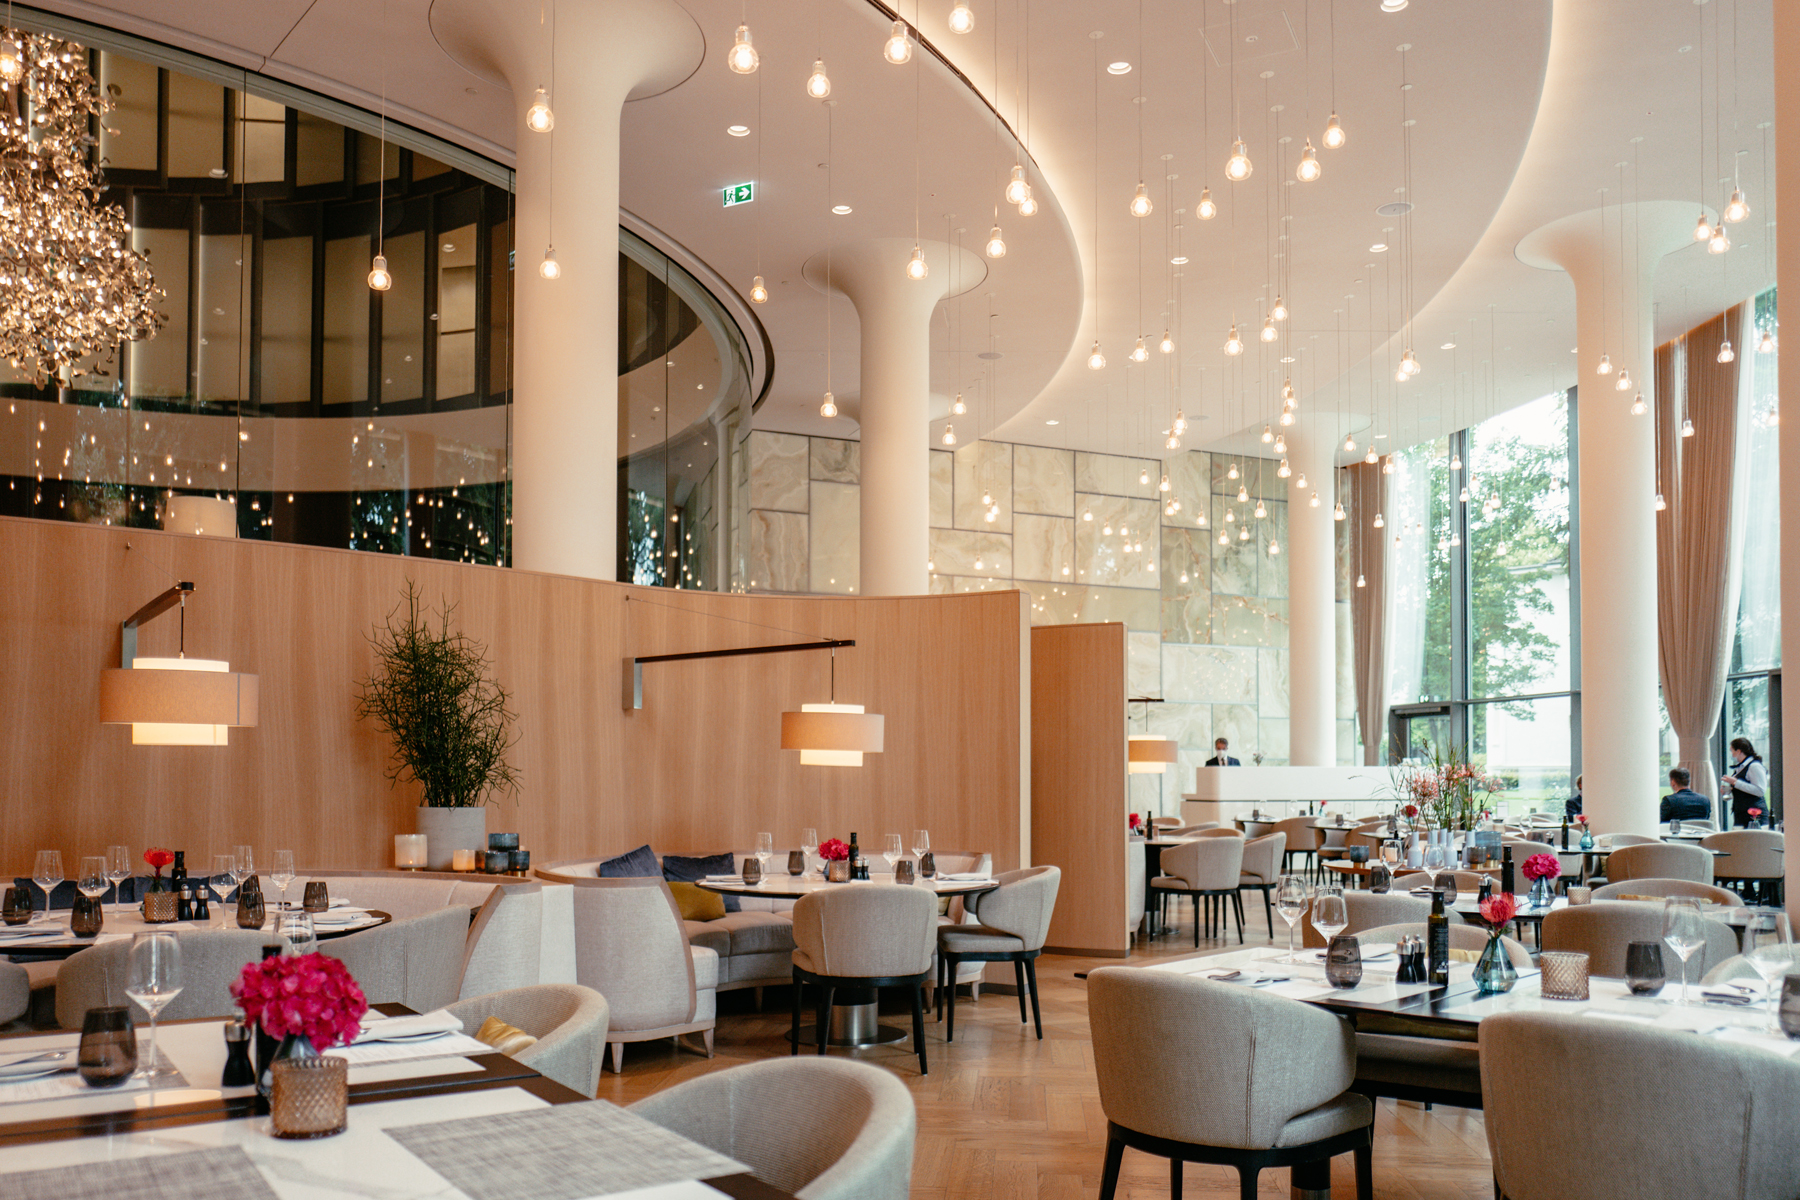 Geheimtipp Hamburg Rotherbaum Restaurant The Fontenay Parkview Dahlina Sophie Kock 003